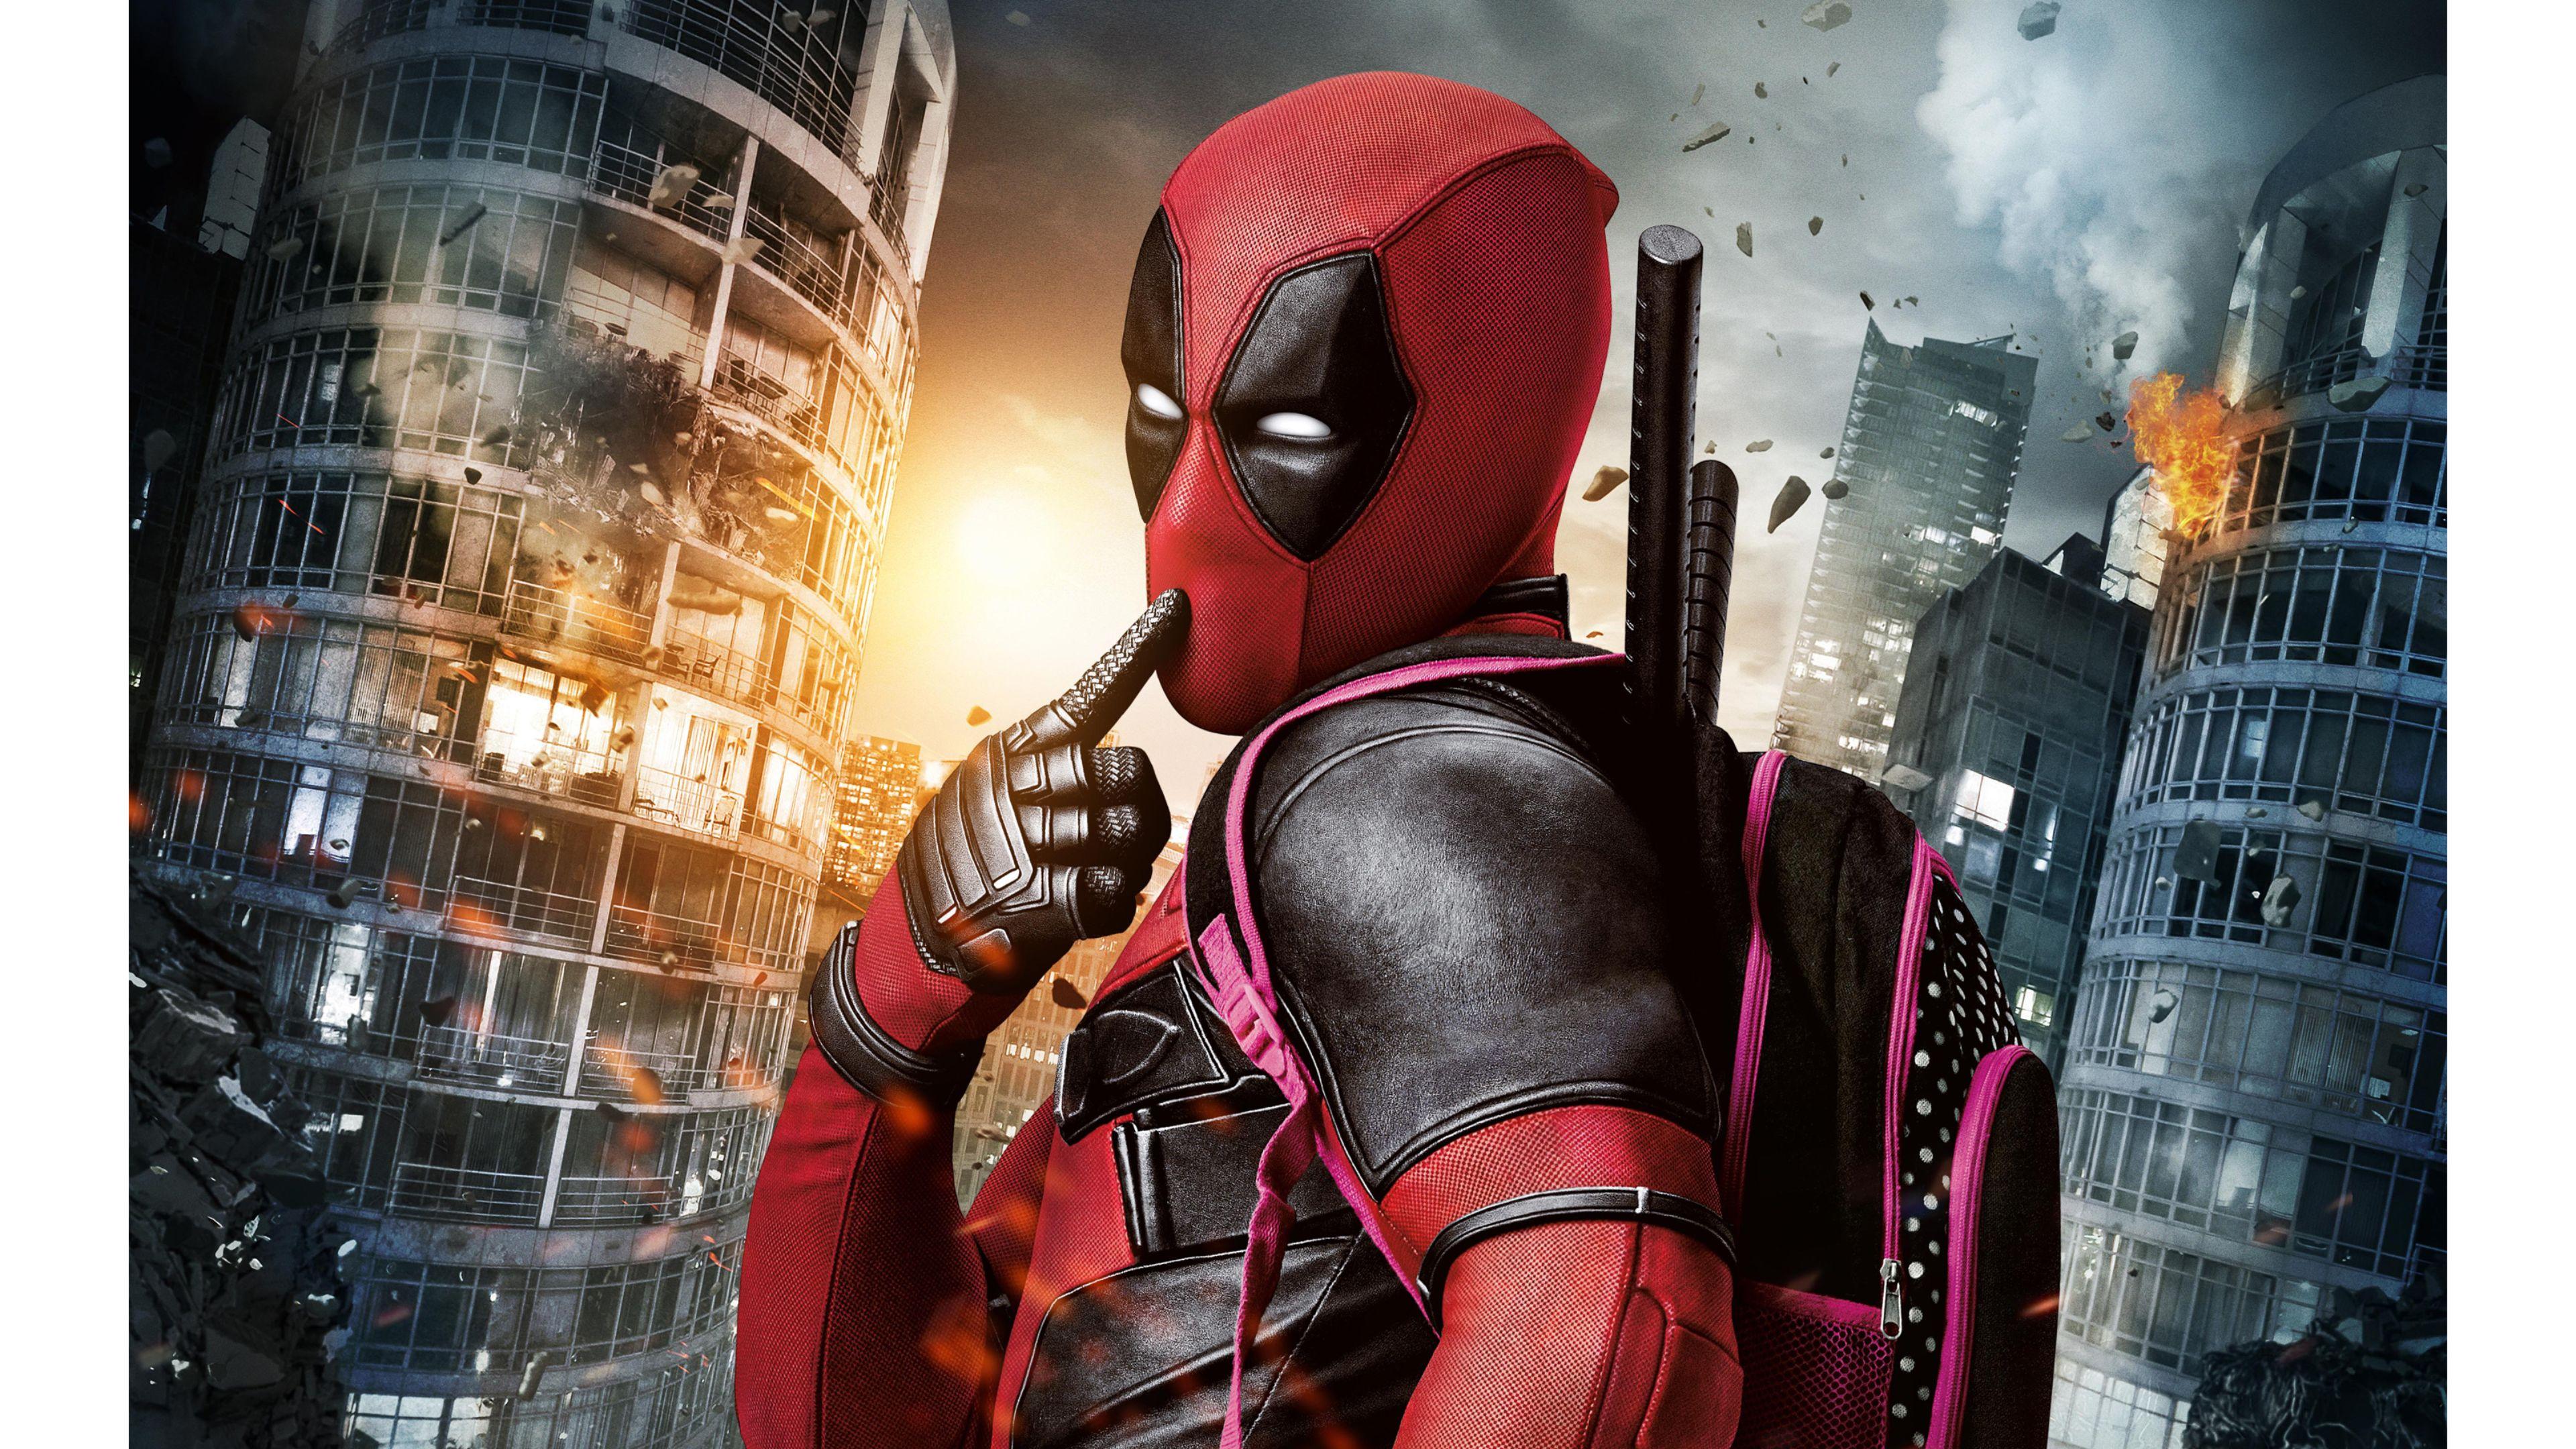 Creative Deadpool Movie 4K Wallpapers 4K Wallpaper 3840x2160